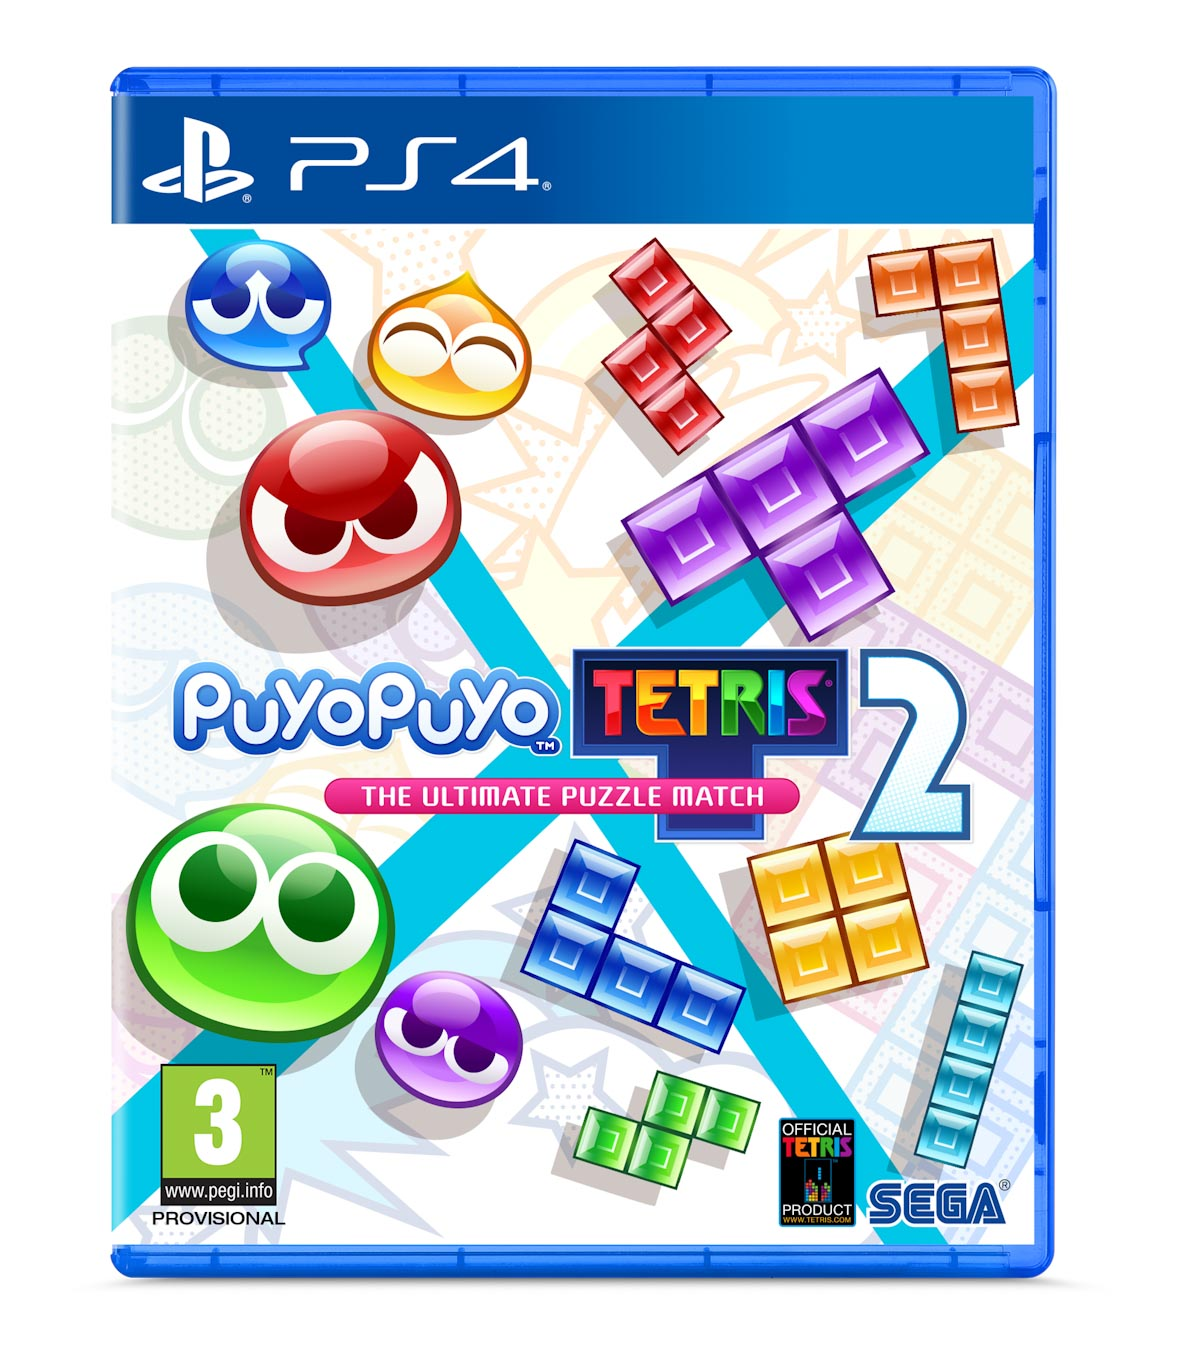 Puyo Puyo Tetris 2 PS4 - SEGA 1.12.01.01.035